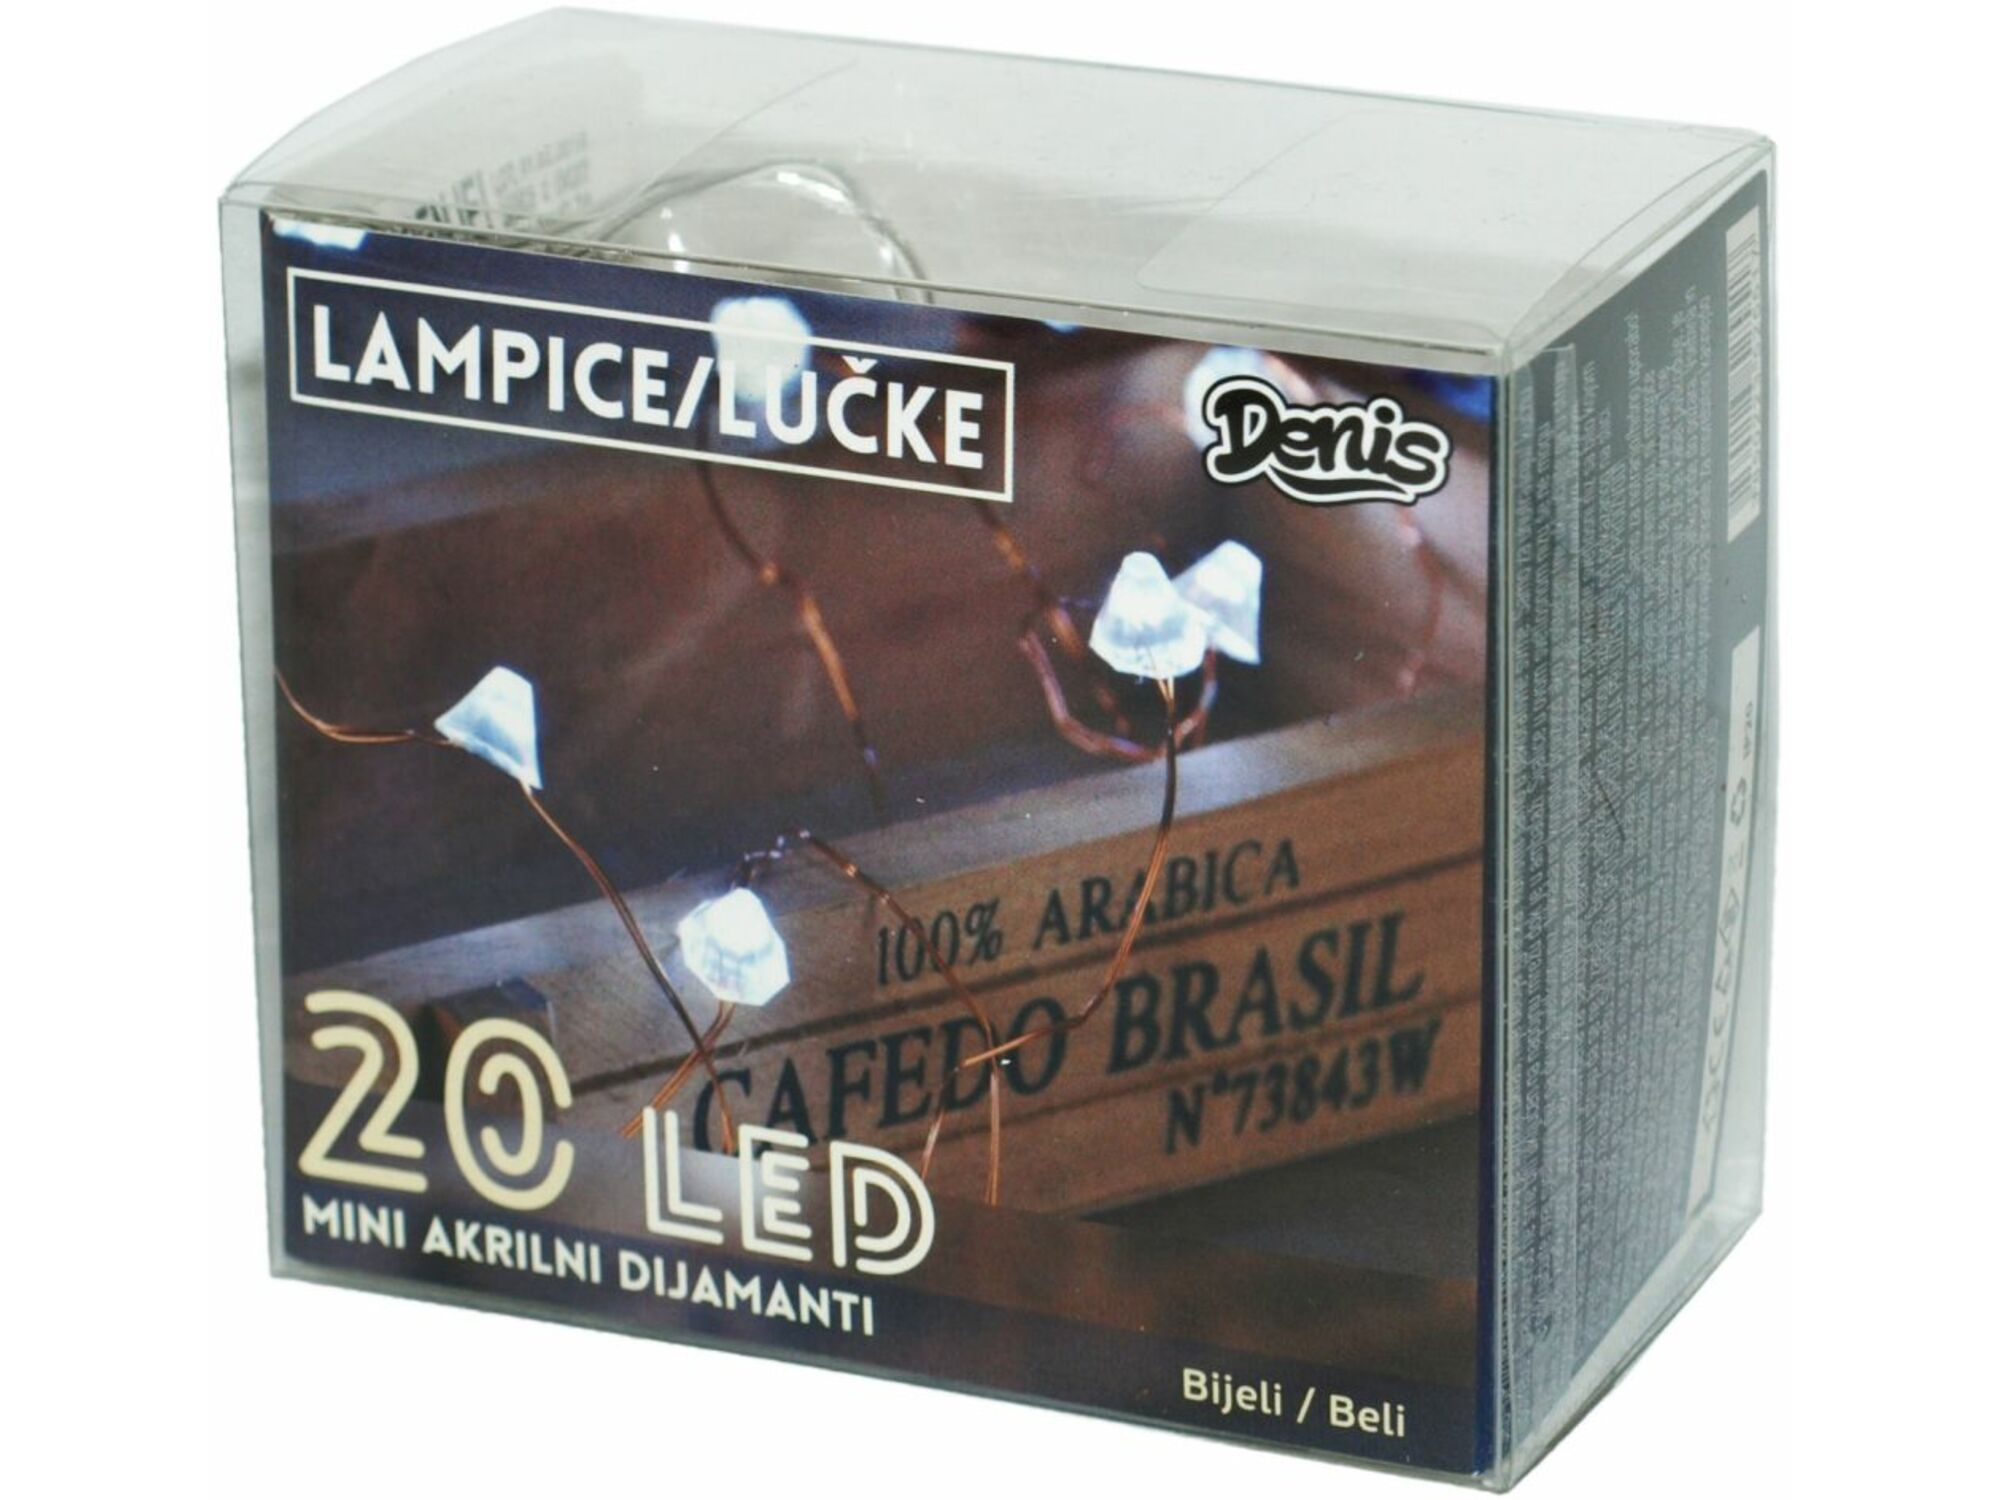 LED mini akril dijamanti, 20L 52-551000